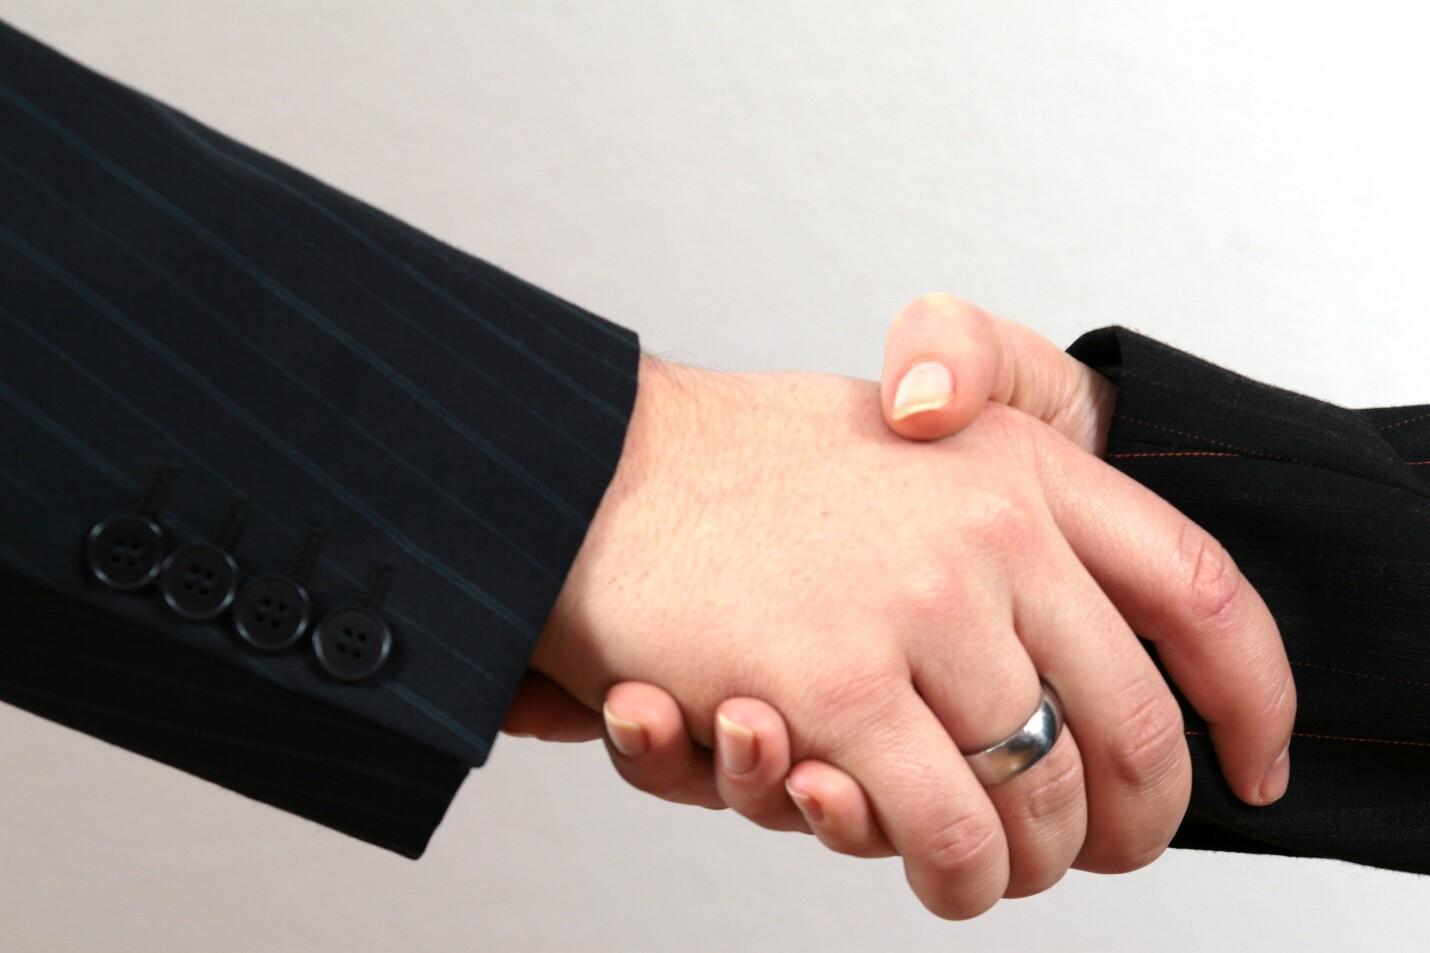 2 hands shaking after collaborative divorce